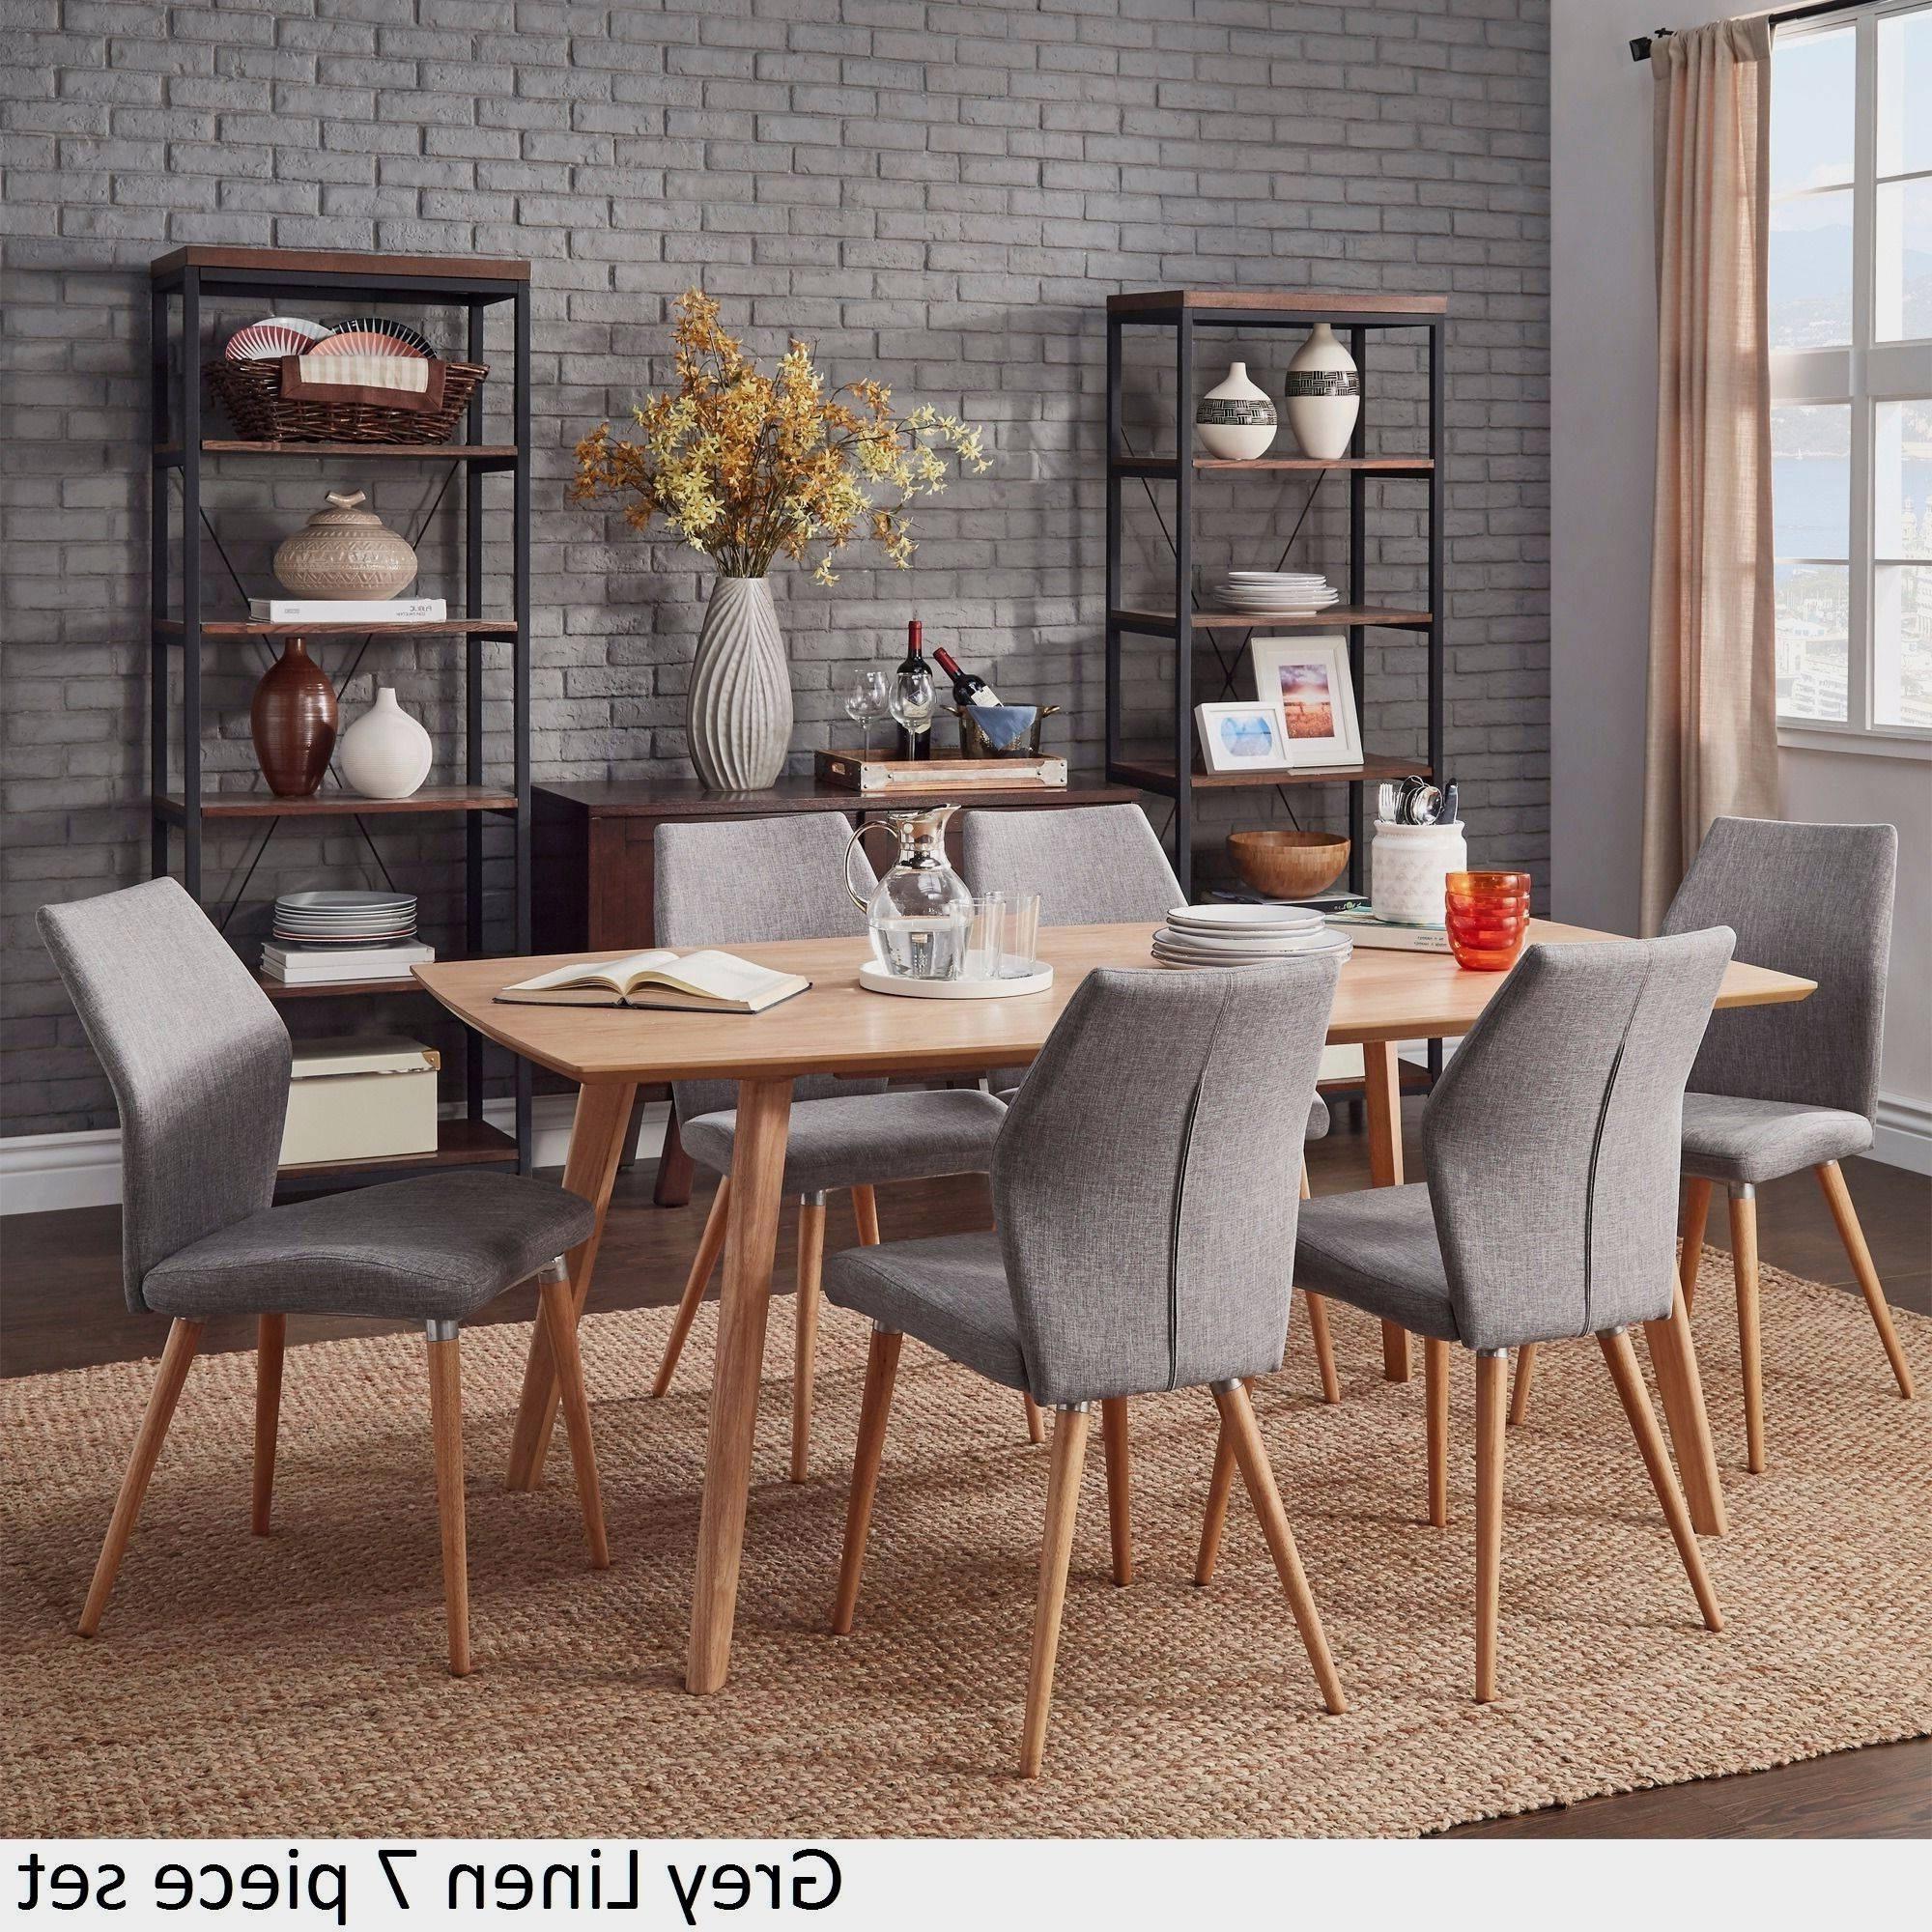 2019 Kirkland Patio Umbrellas Regarding At Home Patio Furniture Unique At Home Design Inspirational Wall (View 1 of 20)